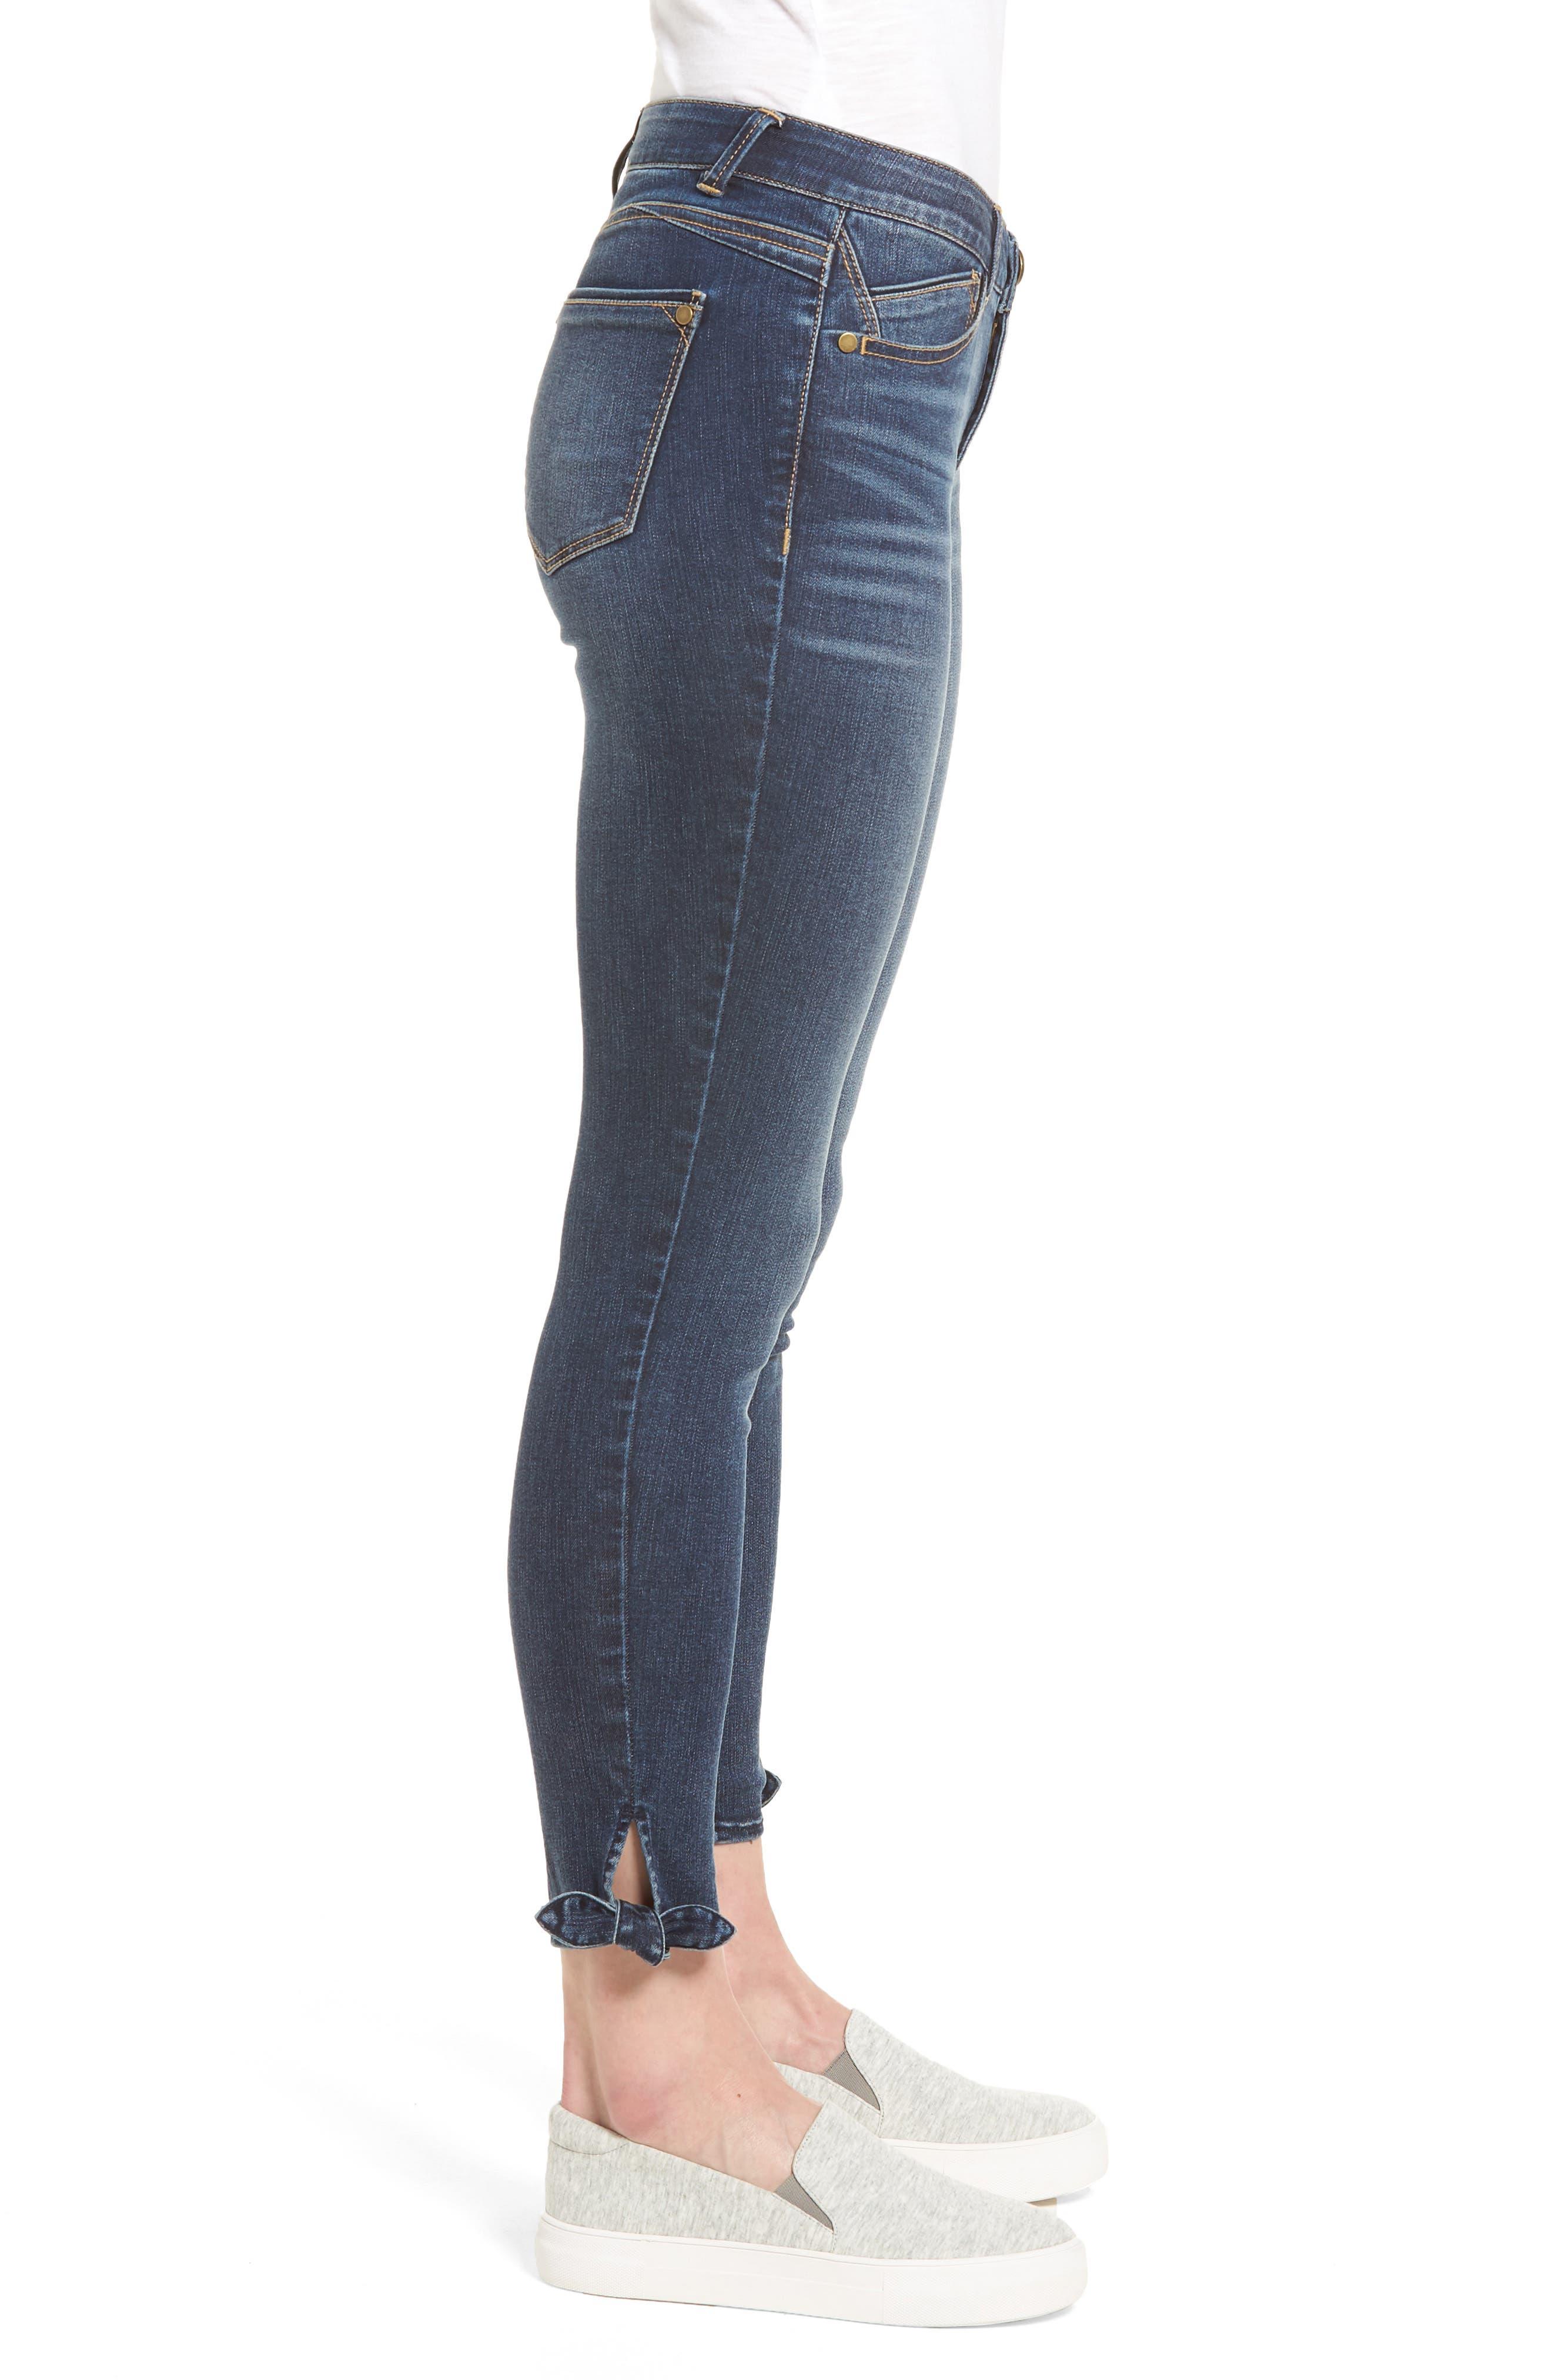 Ab-solution Ankle Skinny Skimmer Jeans,                             Alternate thumbnail 3, color,                             Bl- Blue